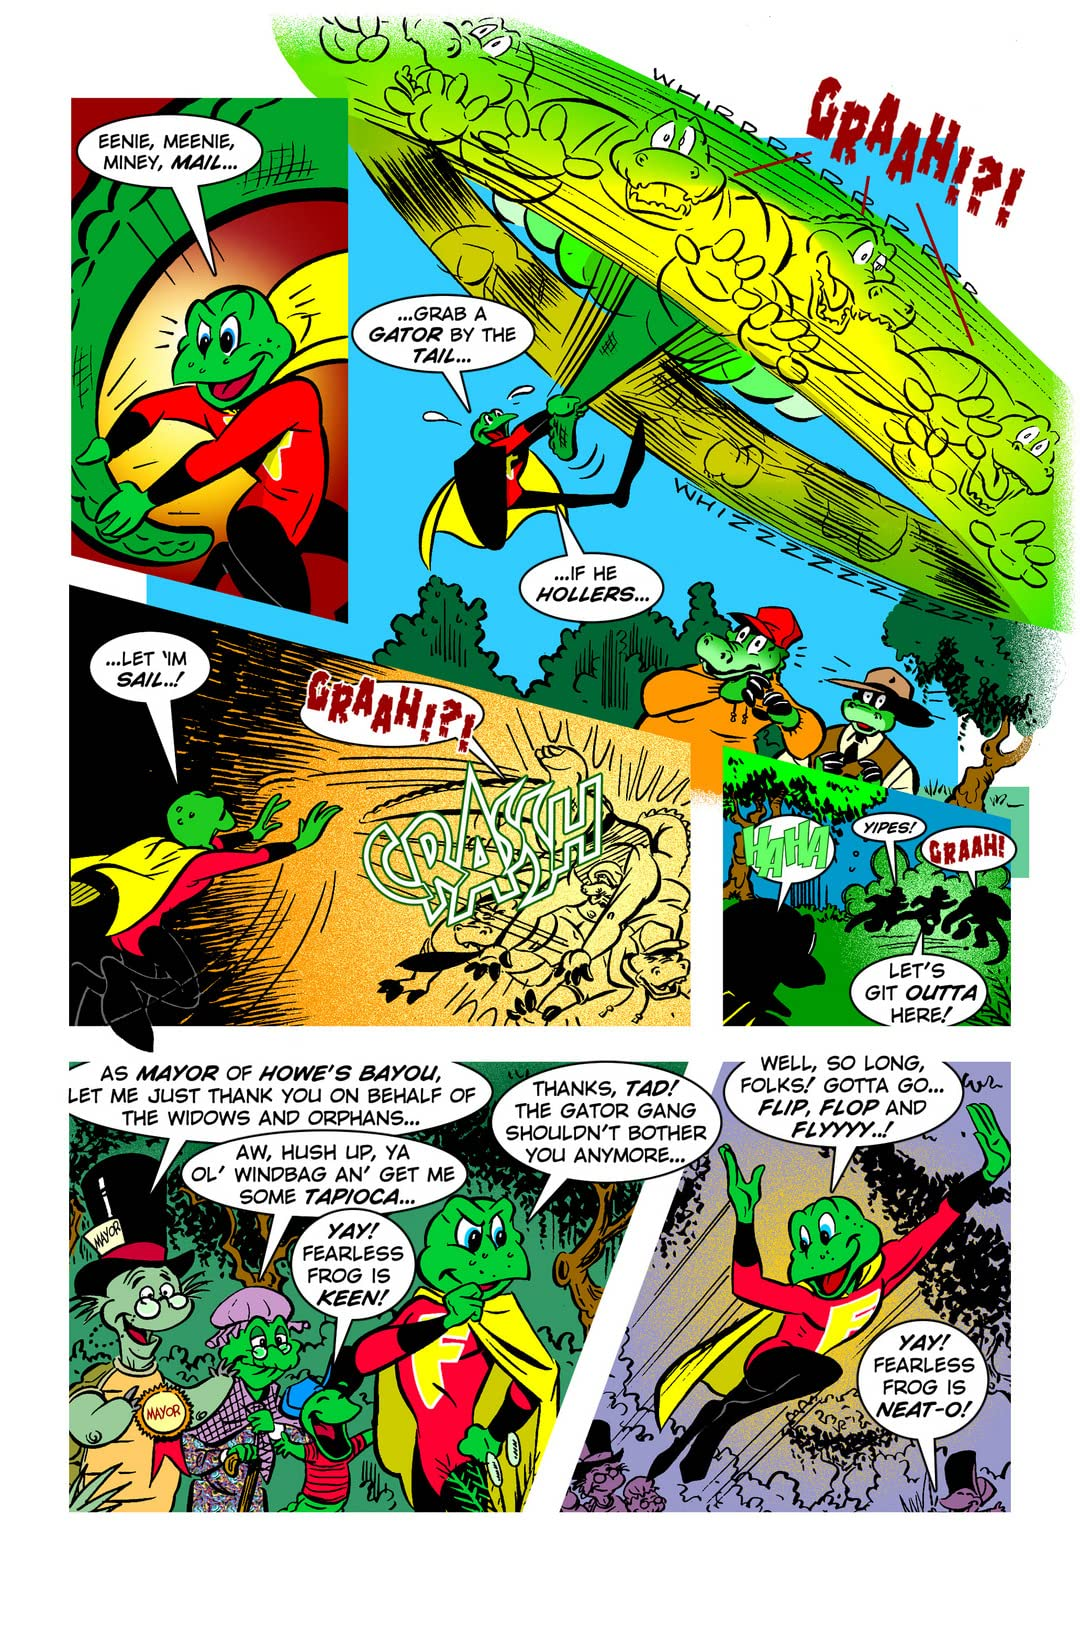 Holy Cow Comics #3